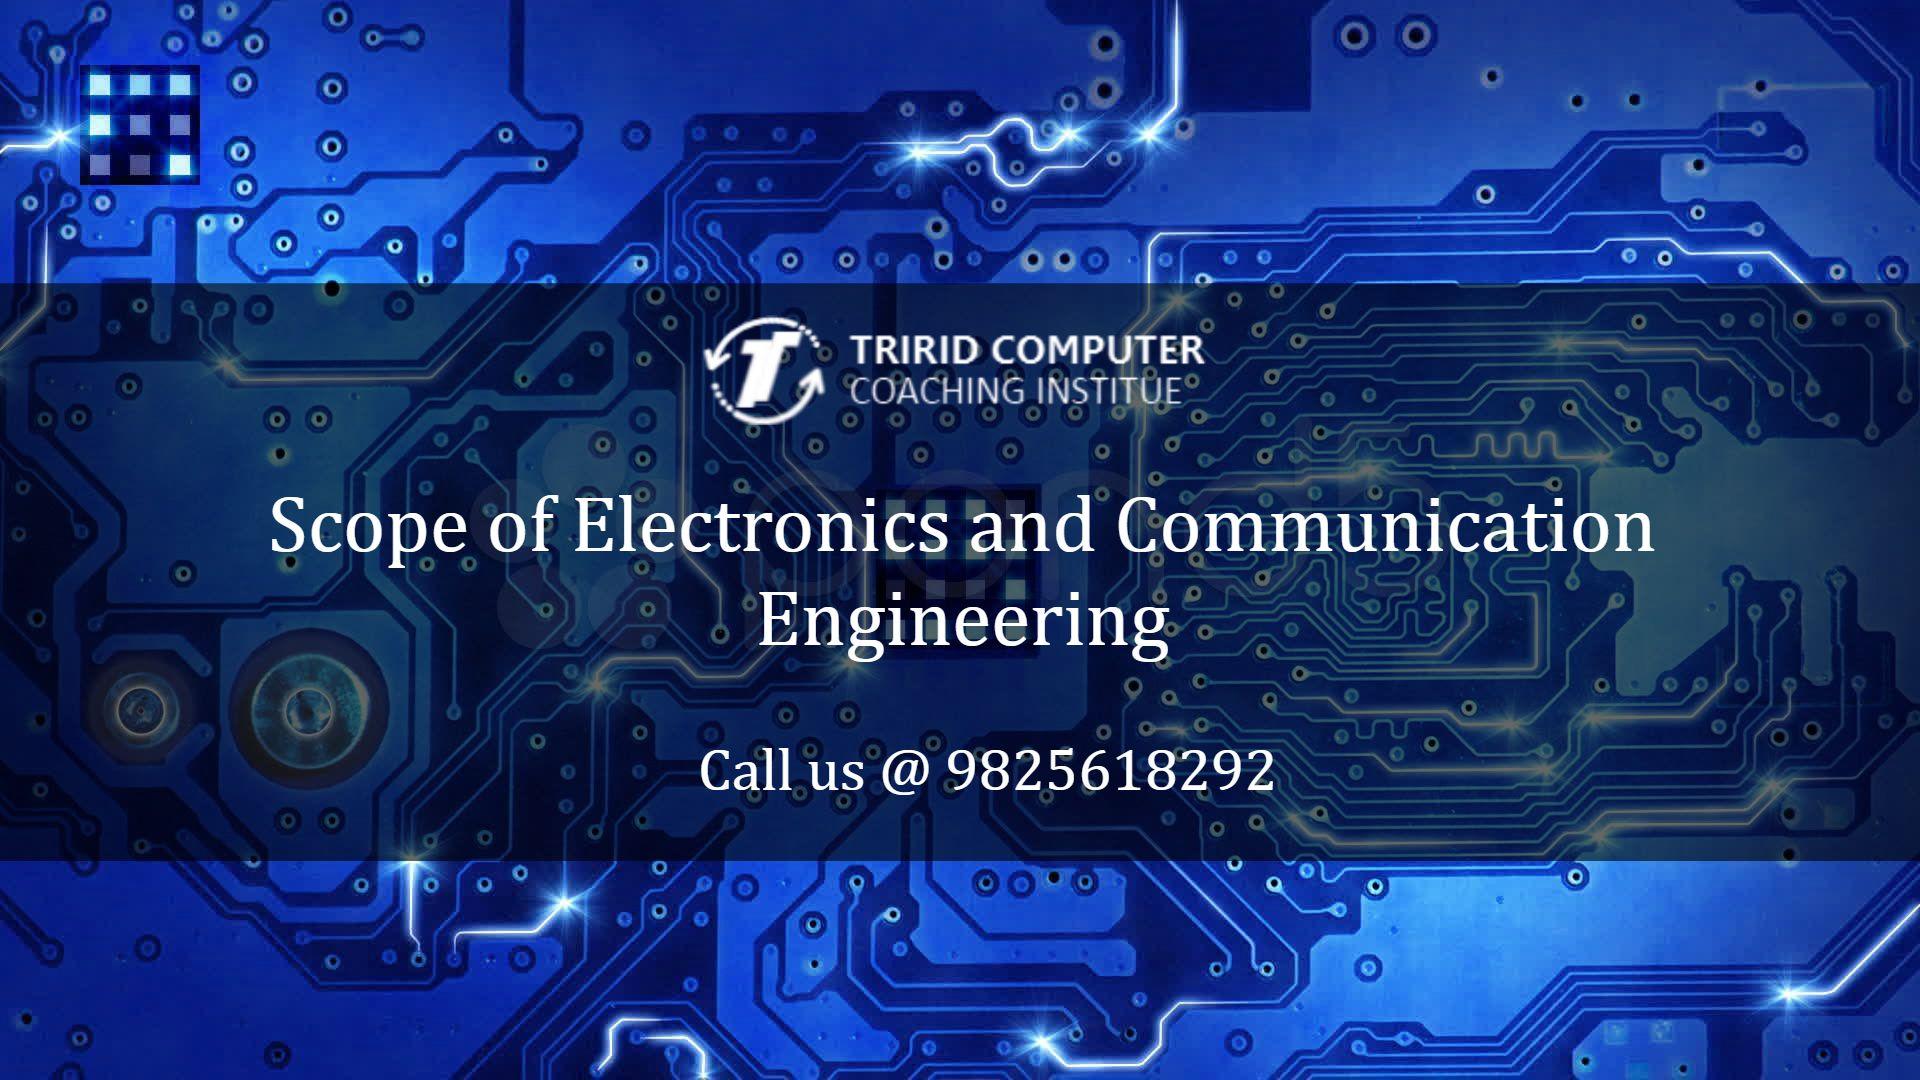 Scope of Electronics and Communication Engineering 1920x1080